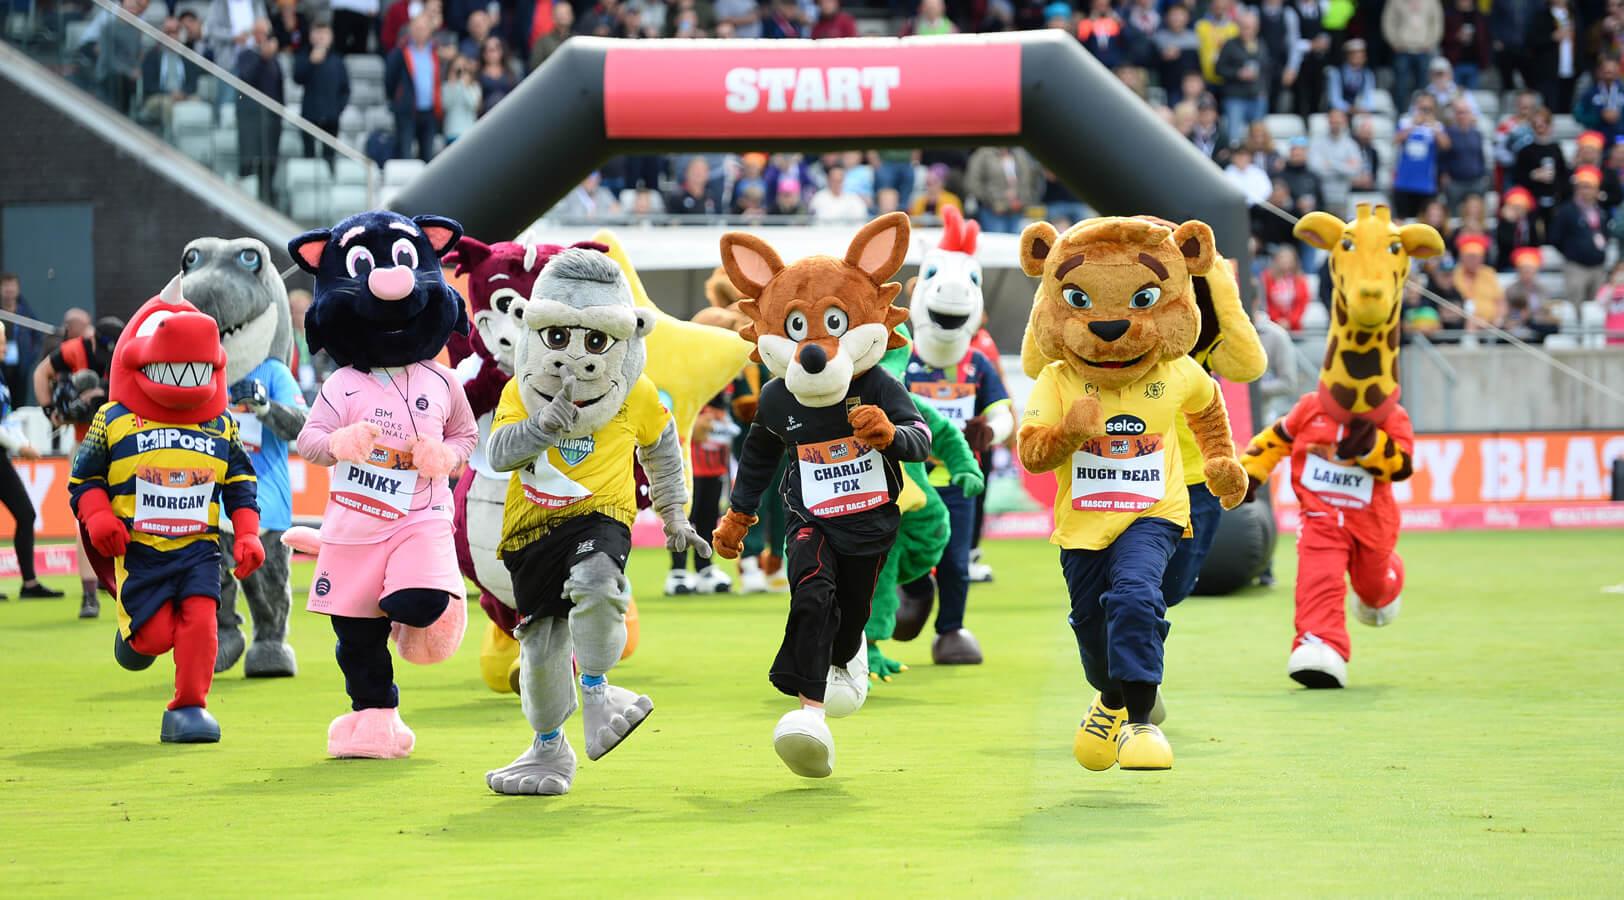 Support Hugh and Carmen Bear in charity mascot race